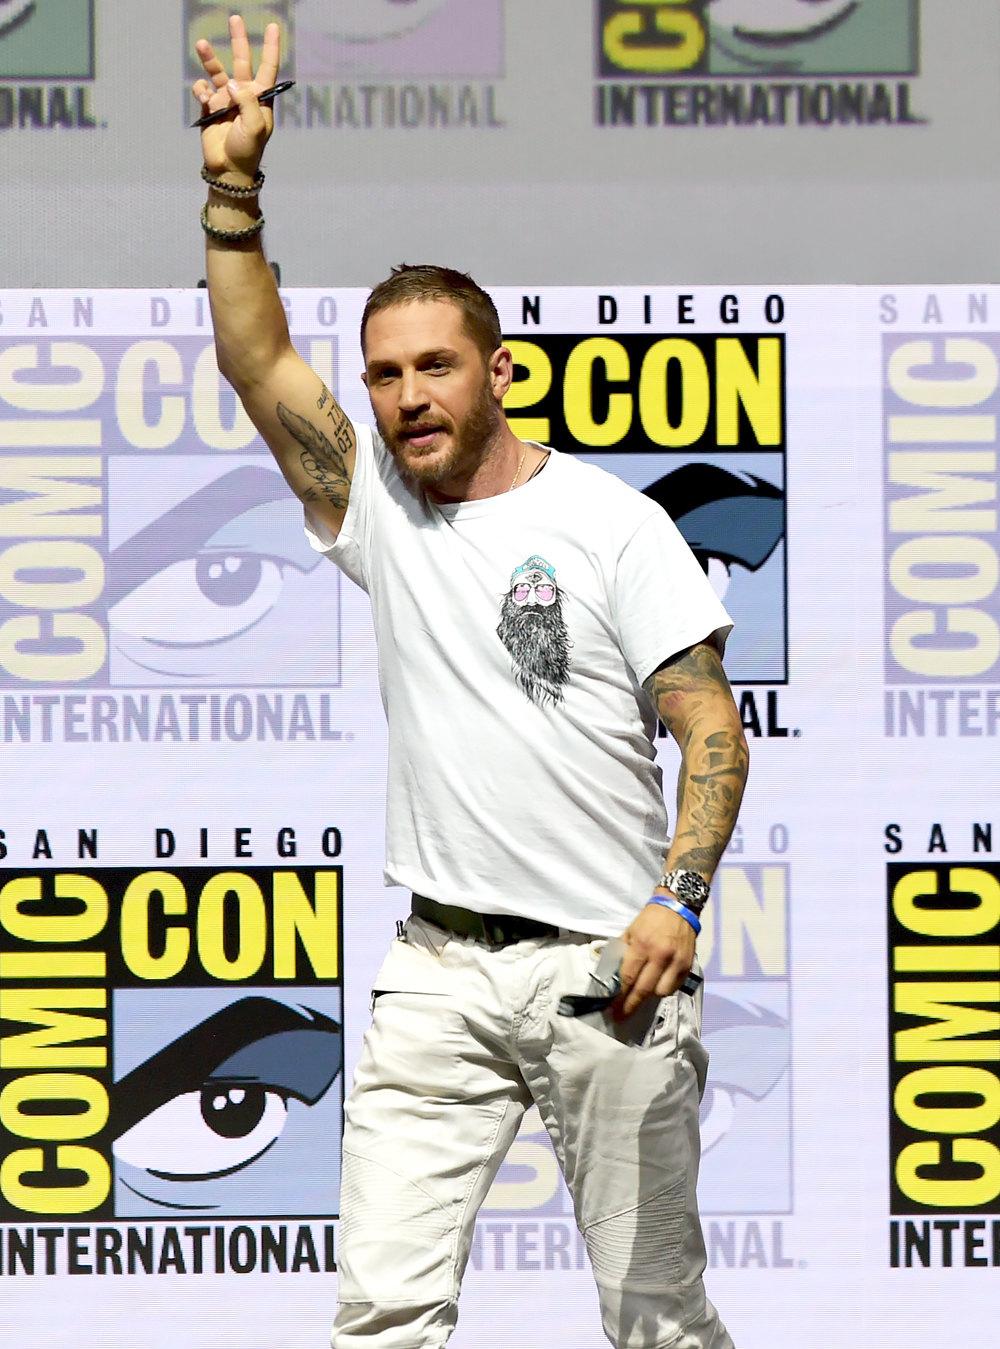 Том Харди нафестивале Comic-Con вСан-Диего, июль 2018